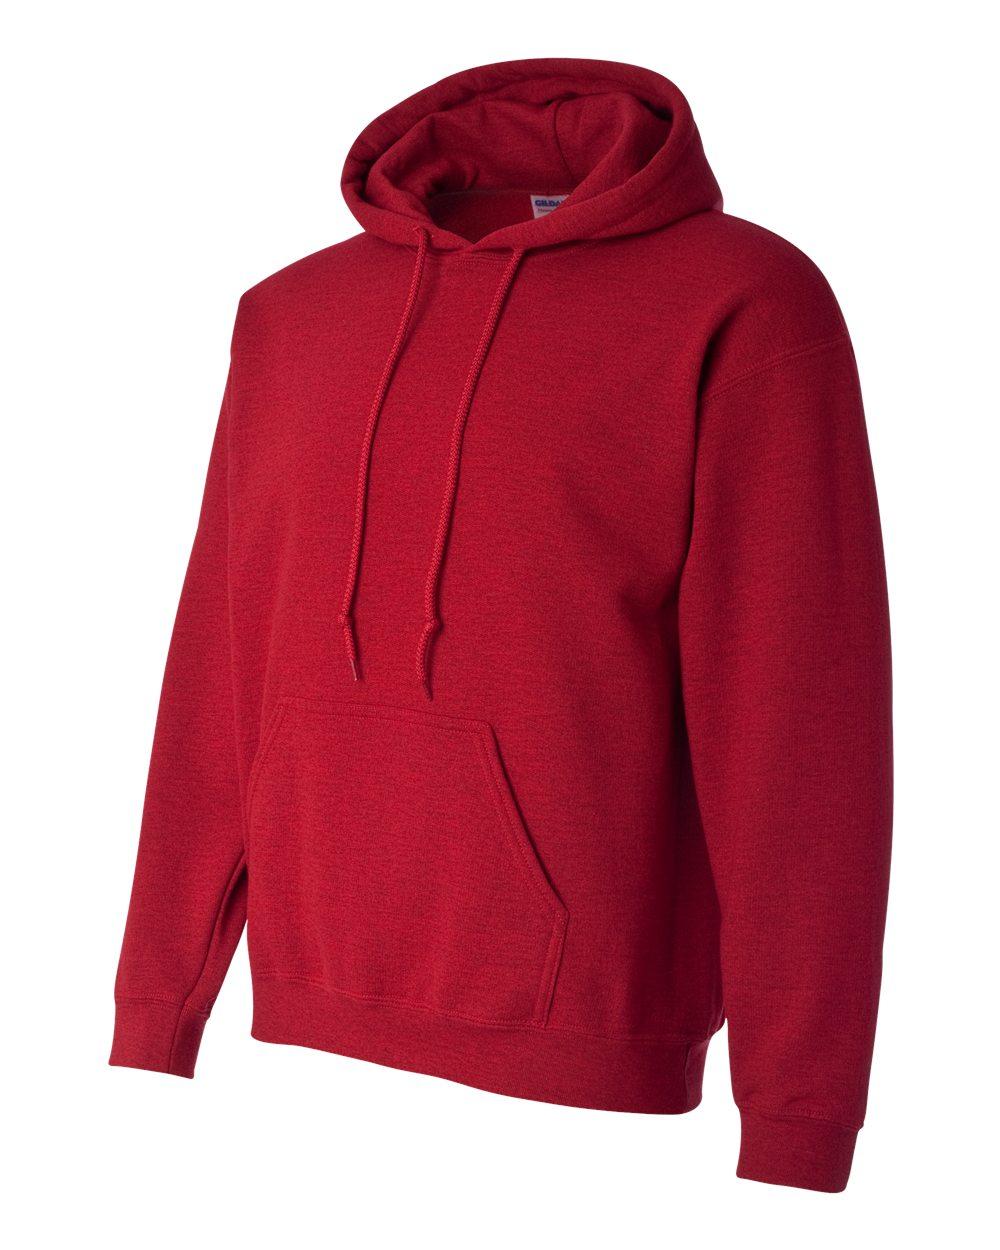 Gildan Heavy Blend Hooded Sweatshirt GI18500 Antique Cherry Red